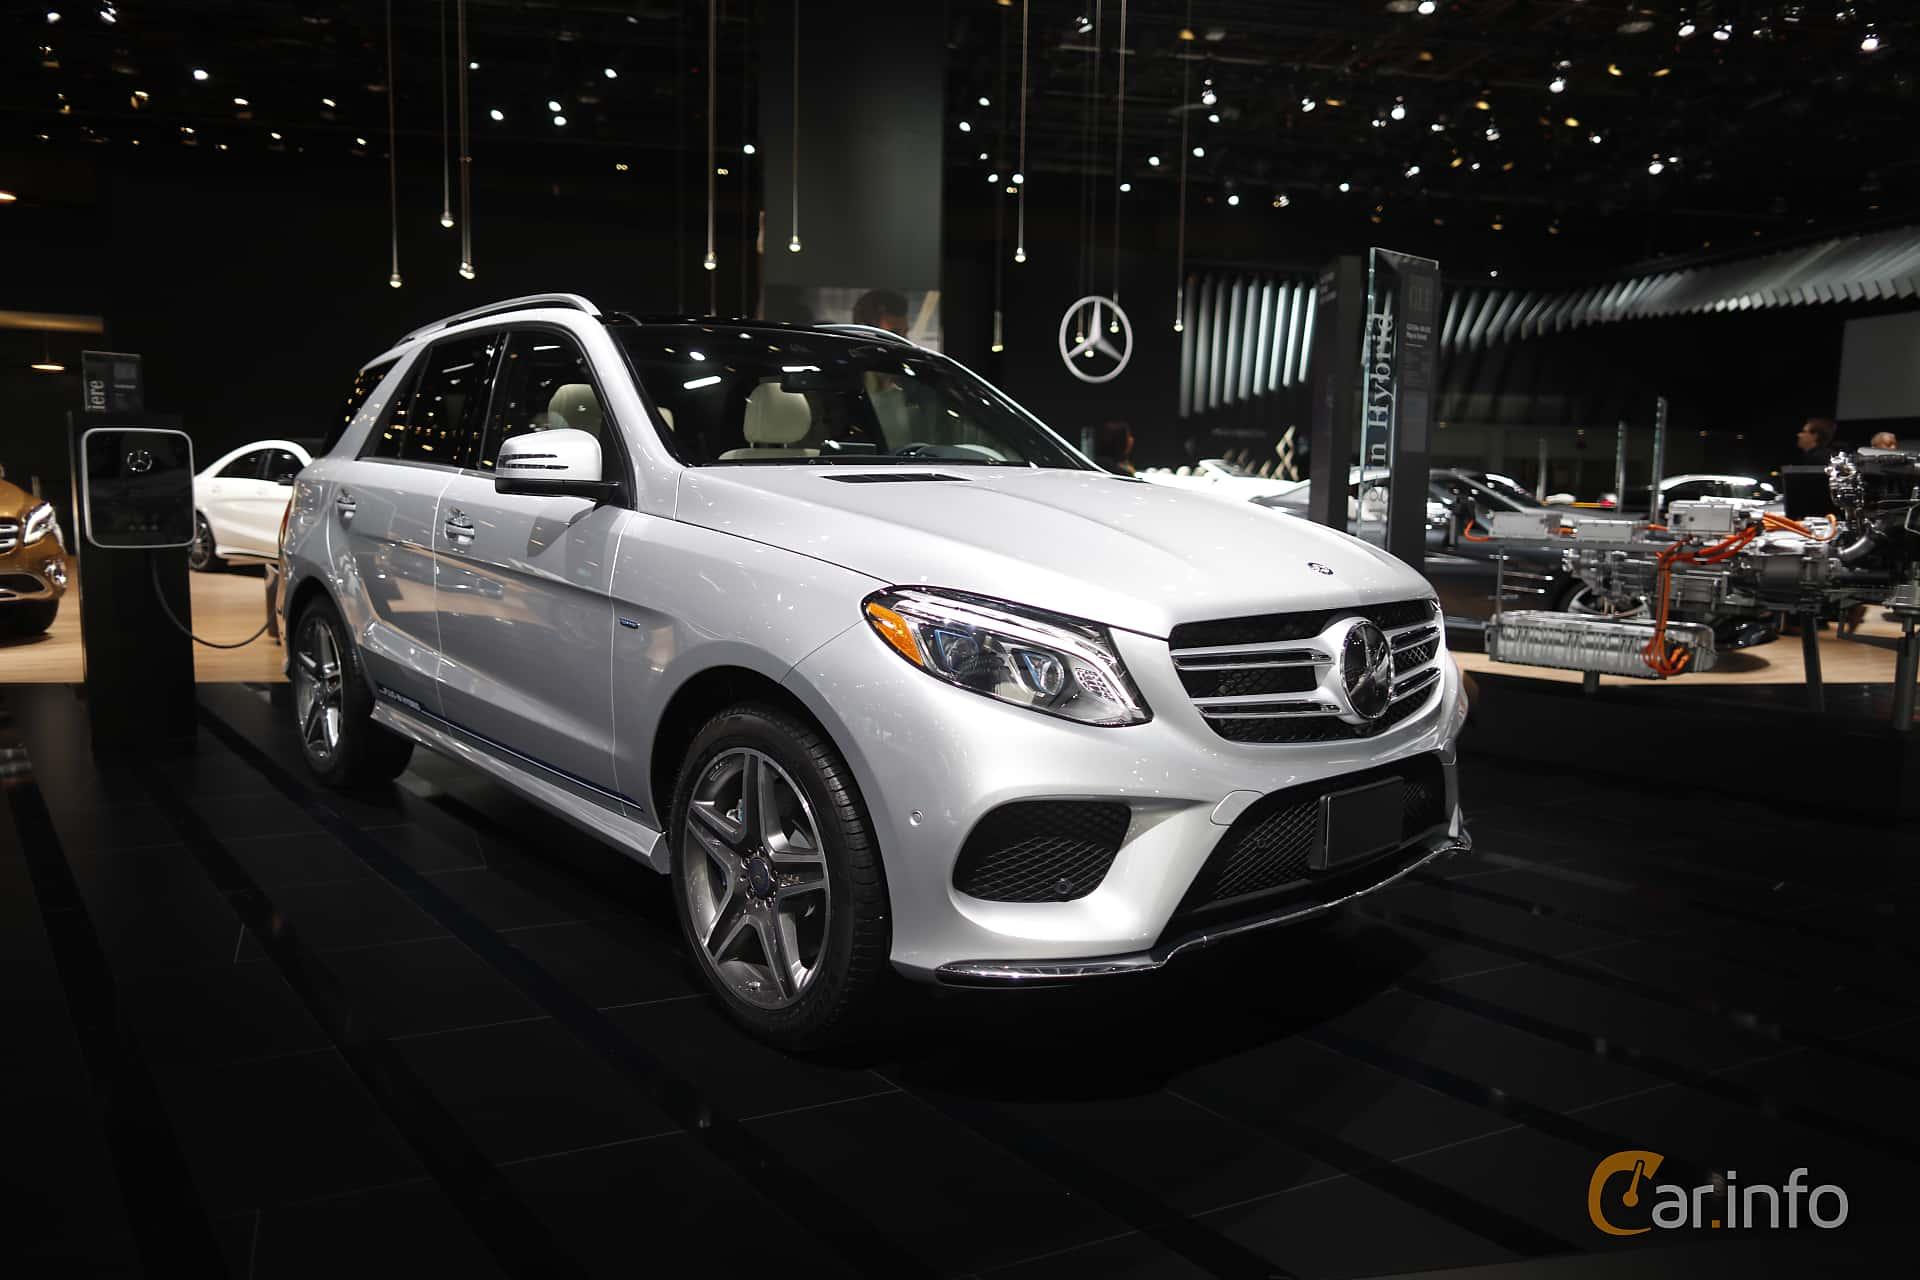 Mercedes-Benz GLE 500 e 4MATIC 3.0 V6 4MATIC 7G-Tronic Plus, 442hp, 2017 at North American International Auto Show 2017